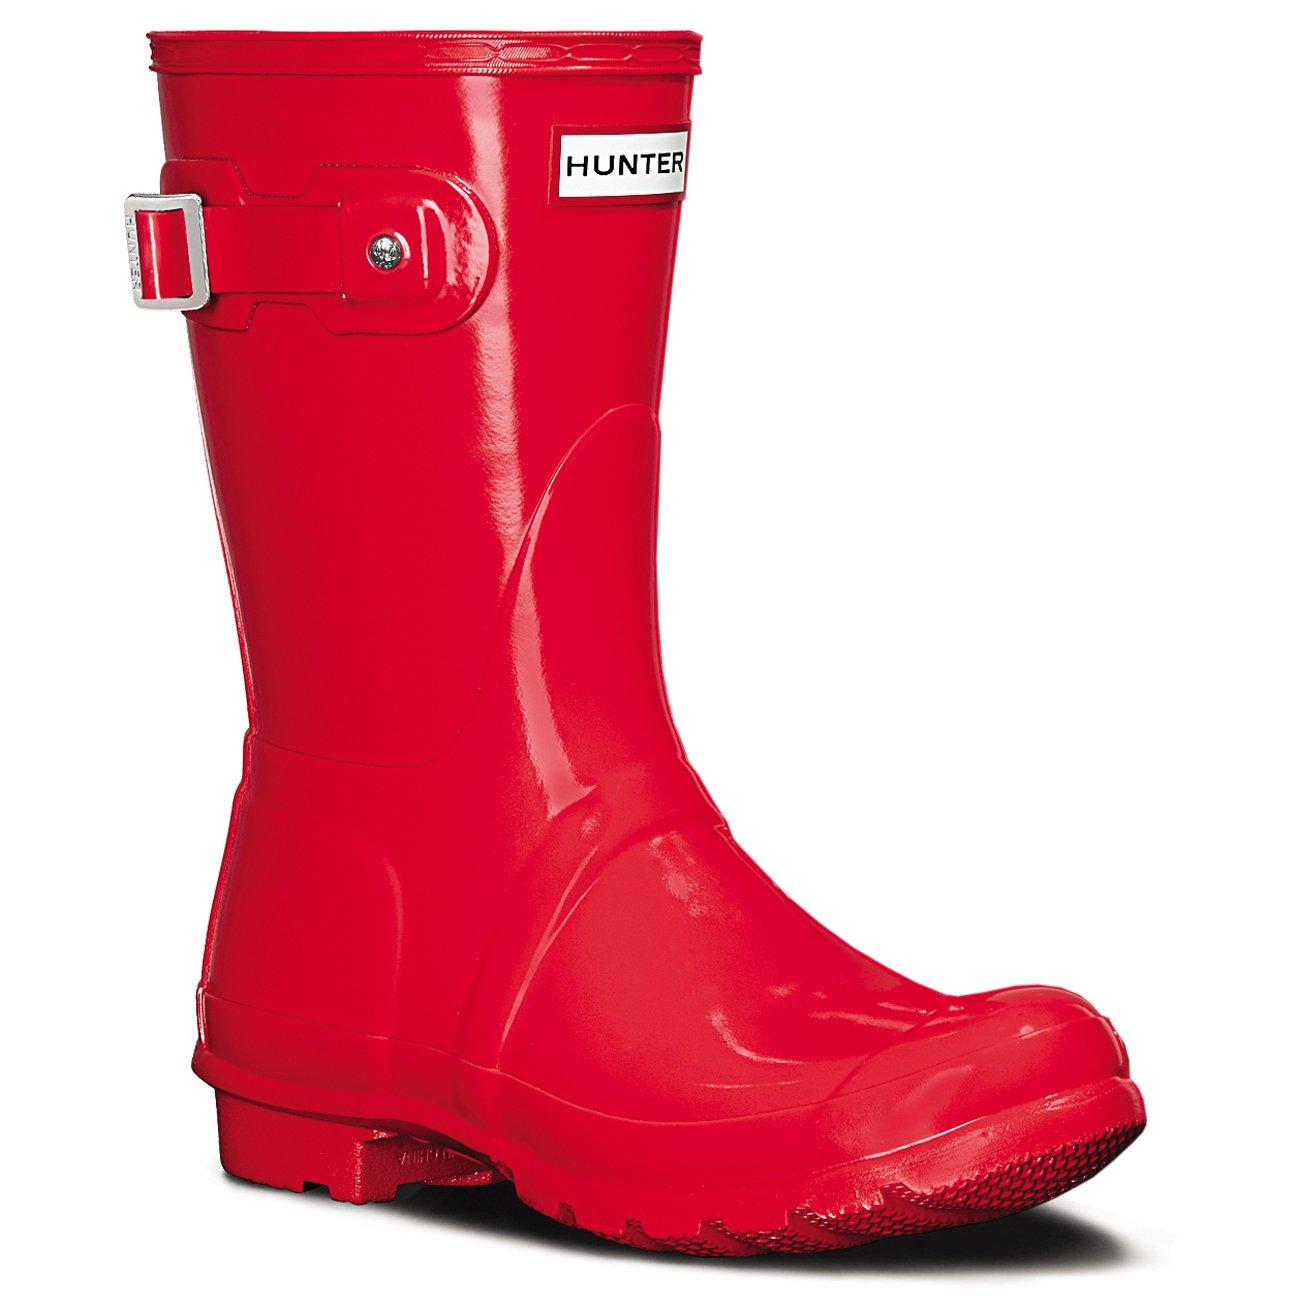 Hunter Womens Original Short Gloss Wellingtons Snow Winter Rain Boots - Bright Coral - 8